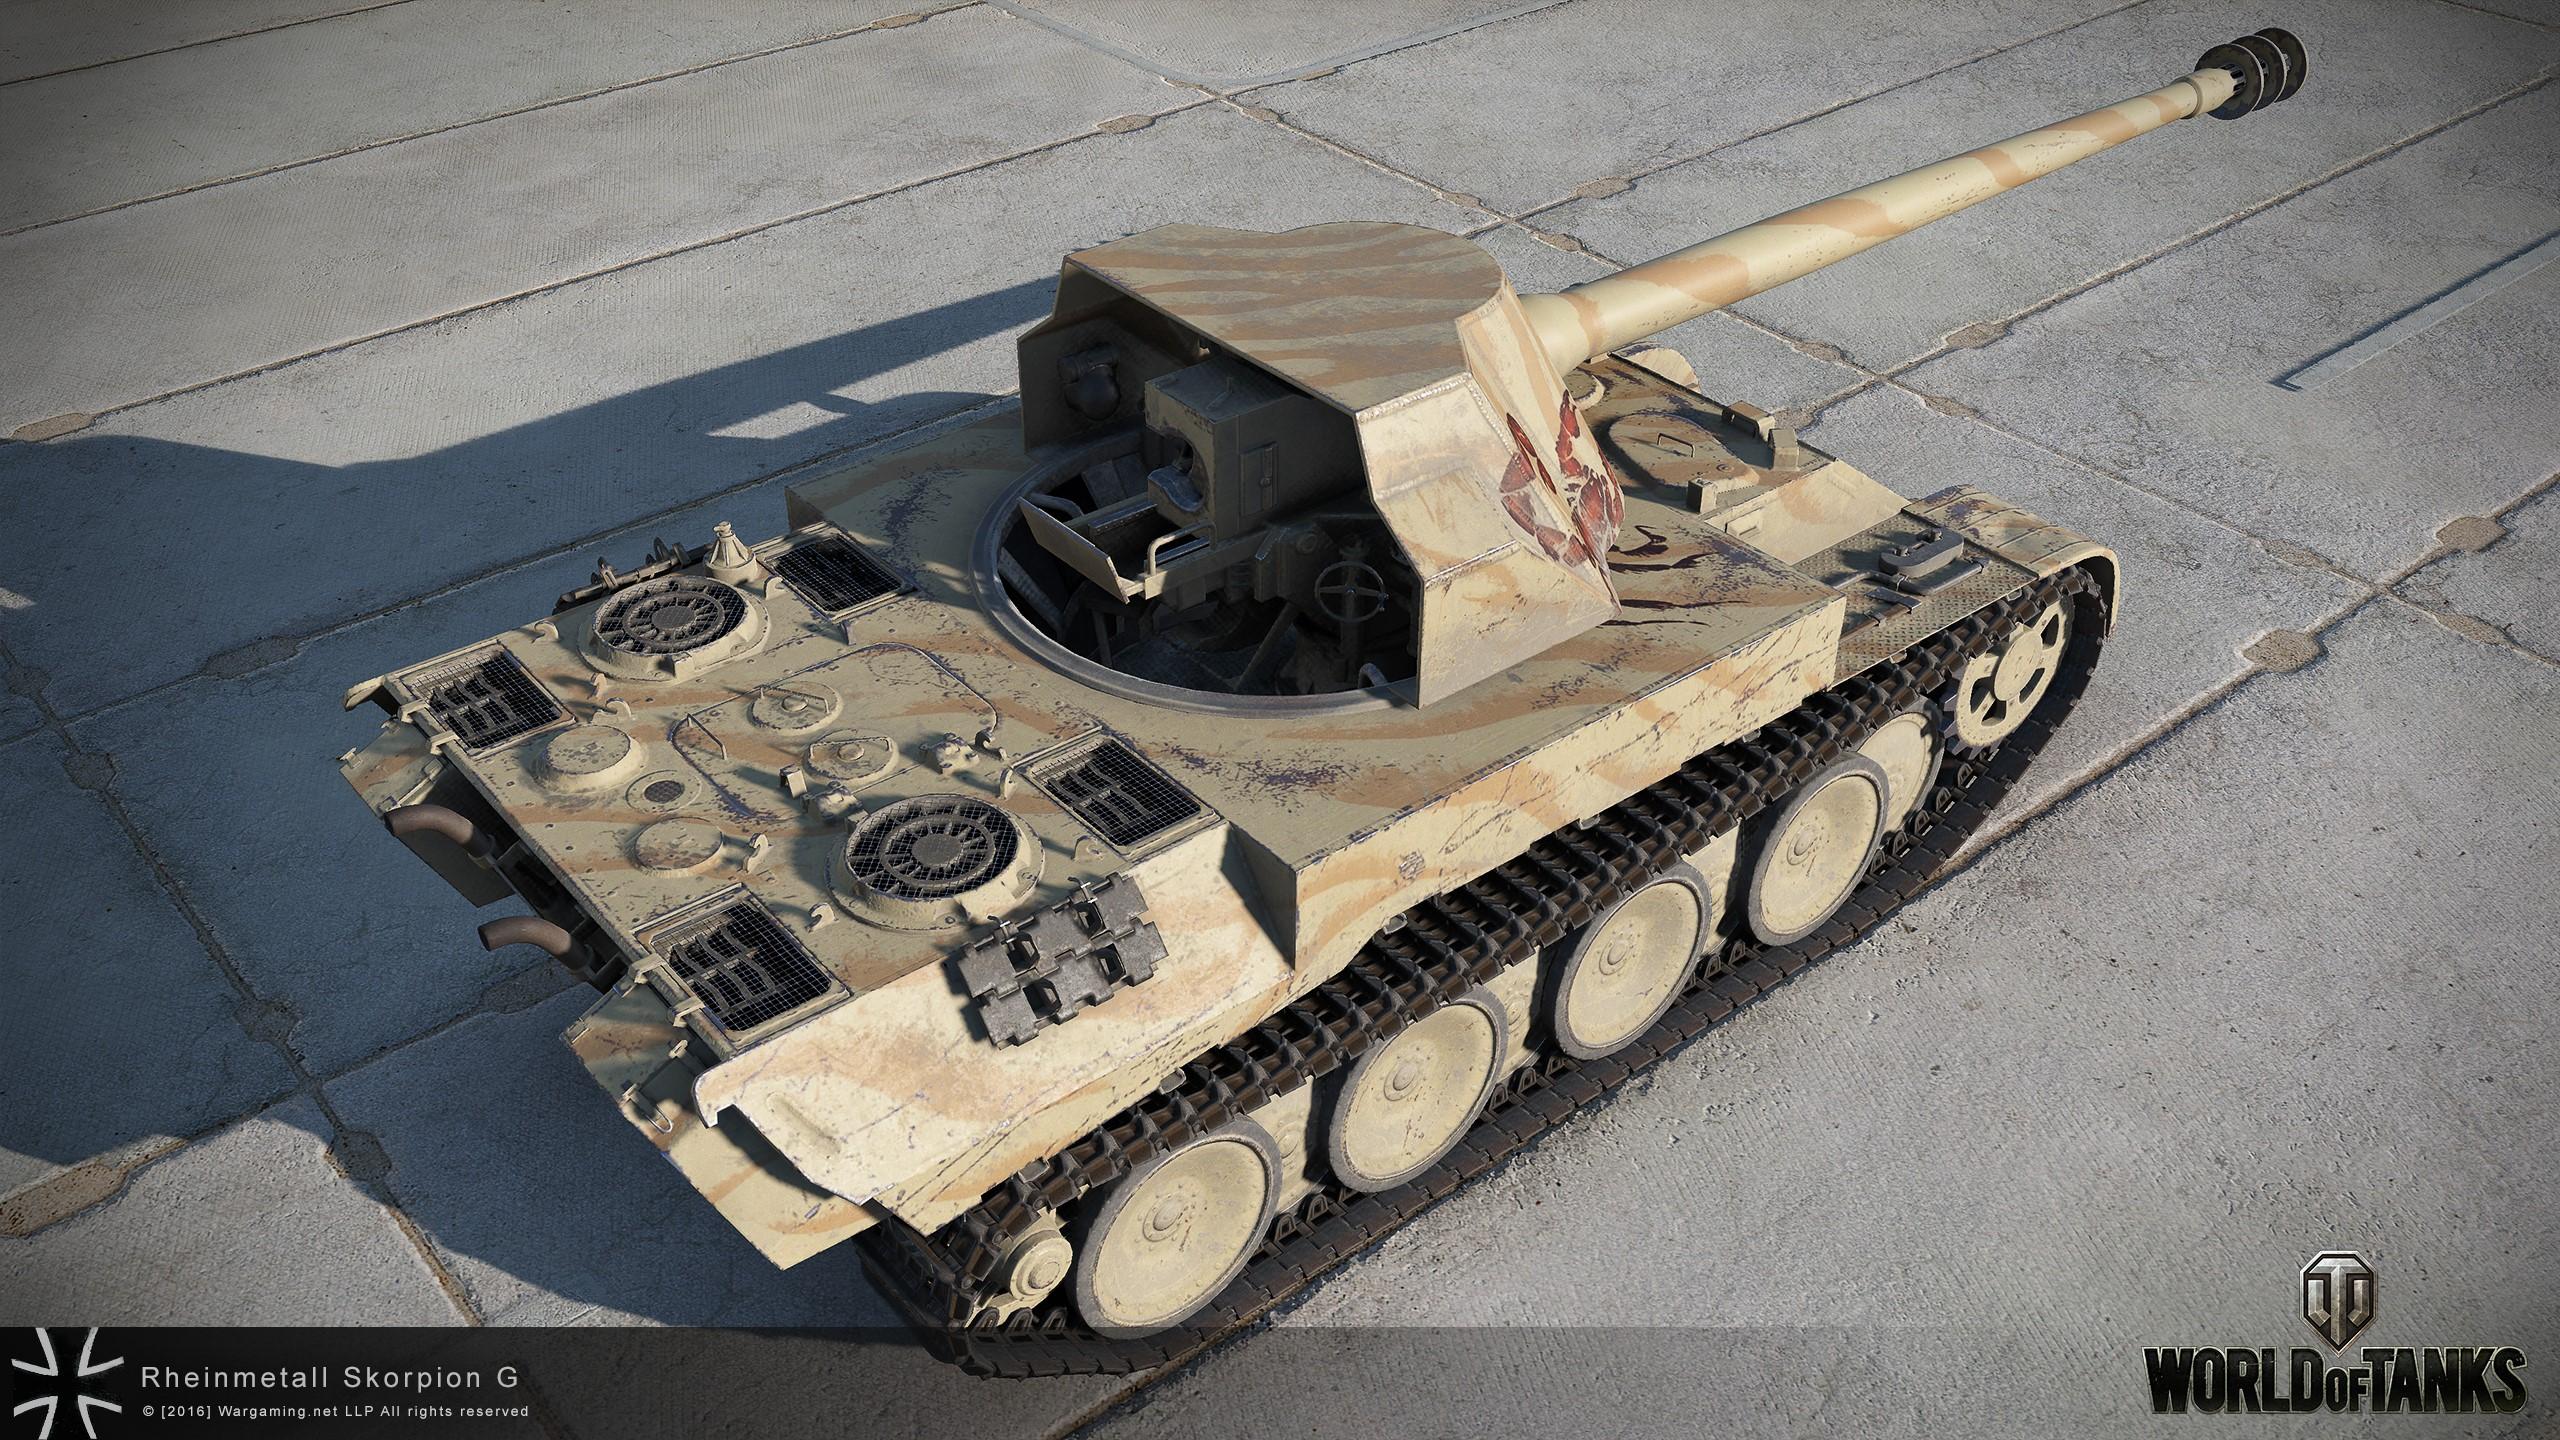 Rheinmetall skorpion купить будет ли продаваться техника за боны